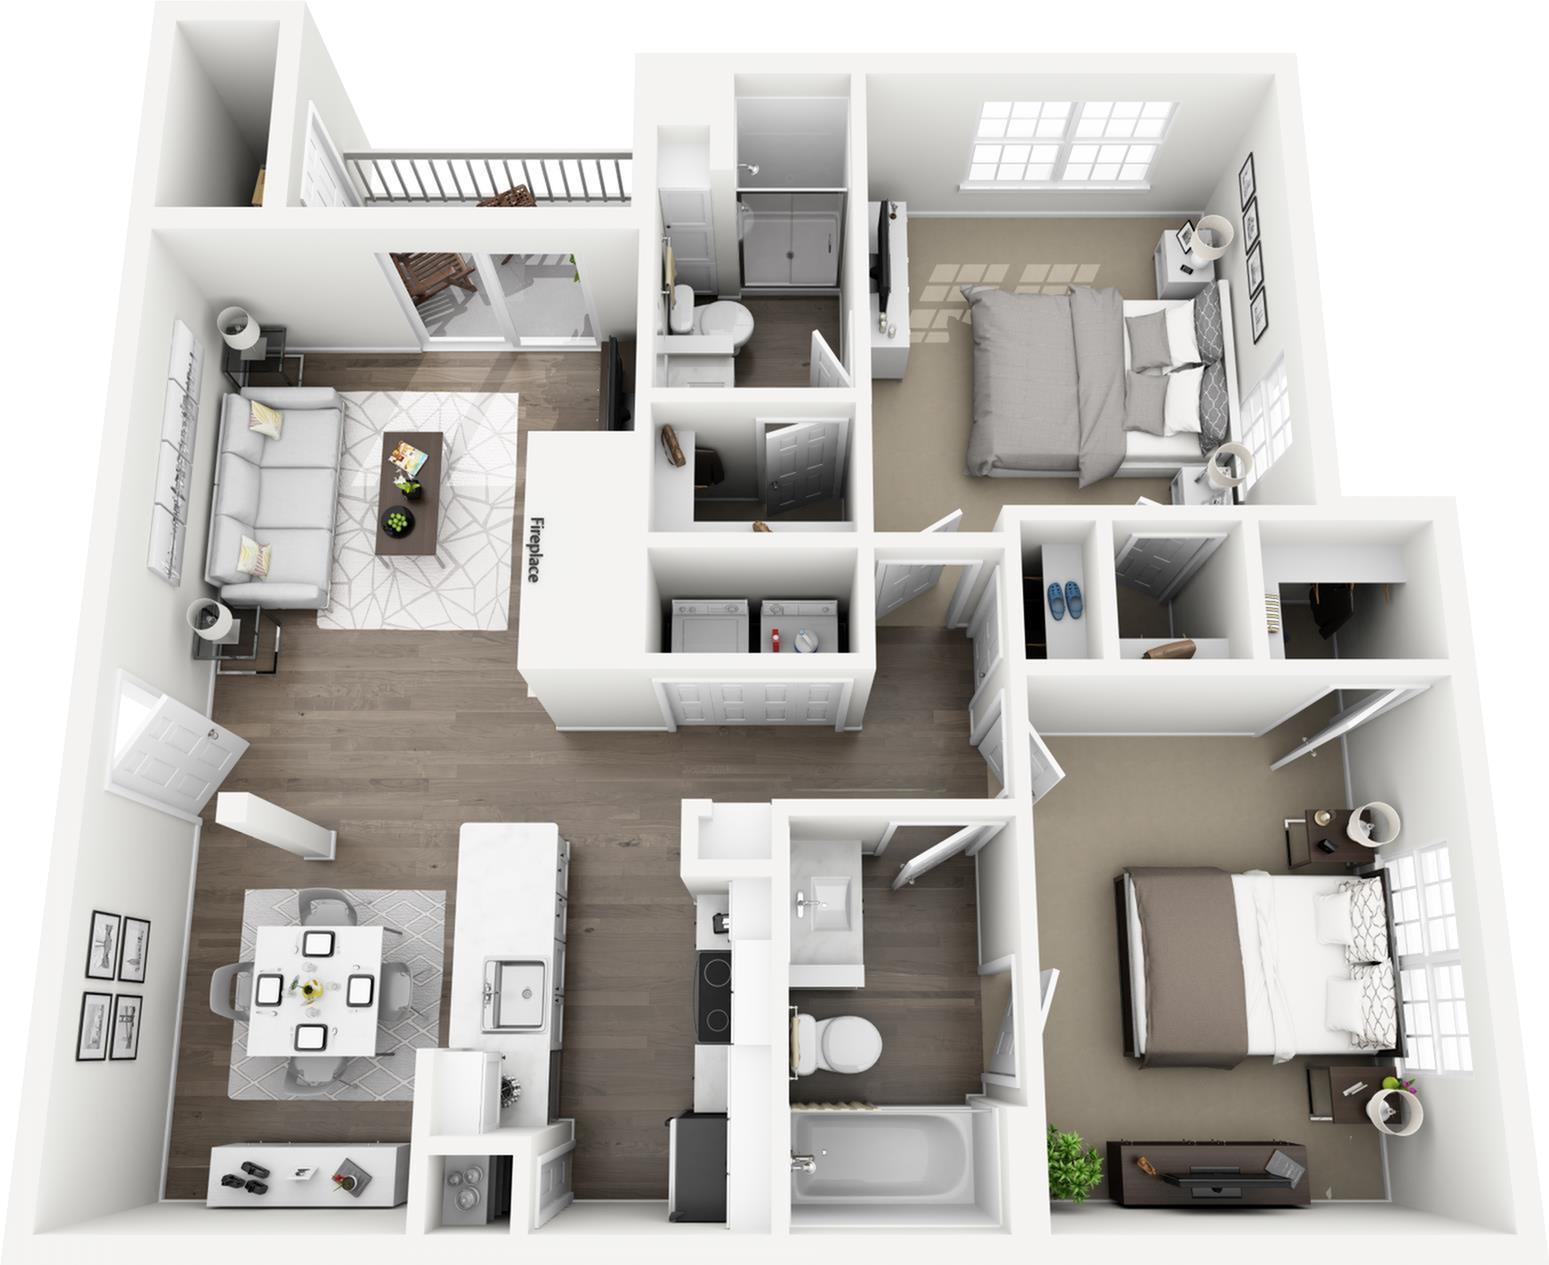 C1 - The Corinthian Floor Plan | Lexington Farms | Apartments in Overland Park, KS